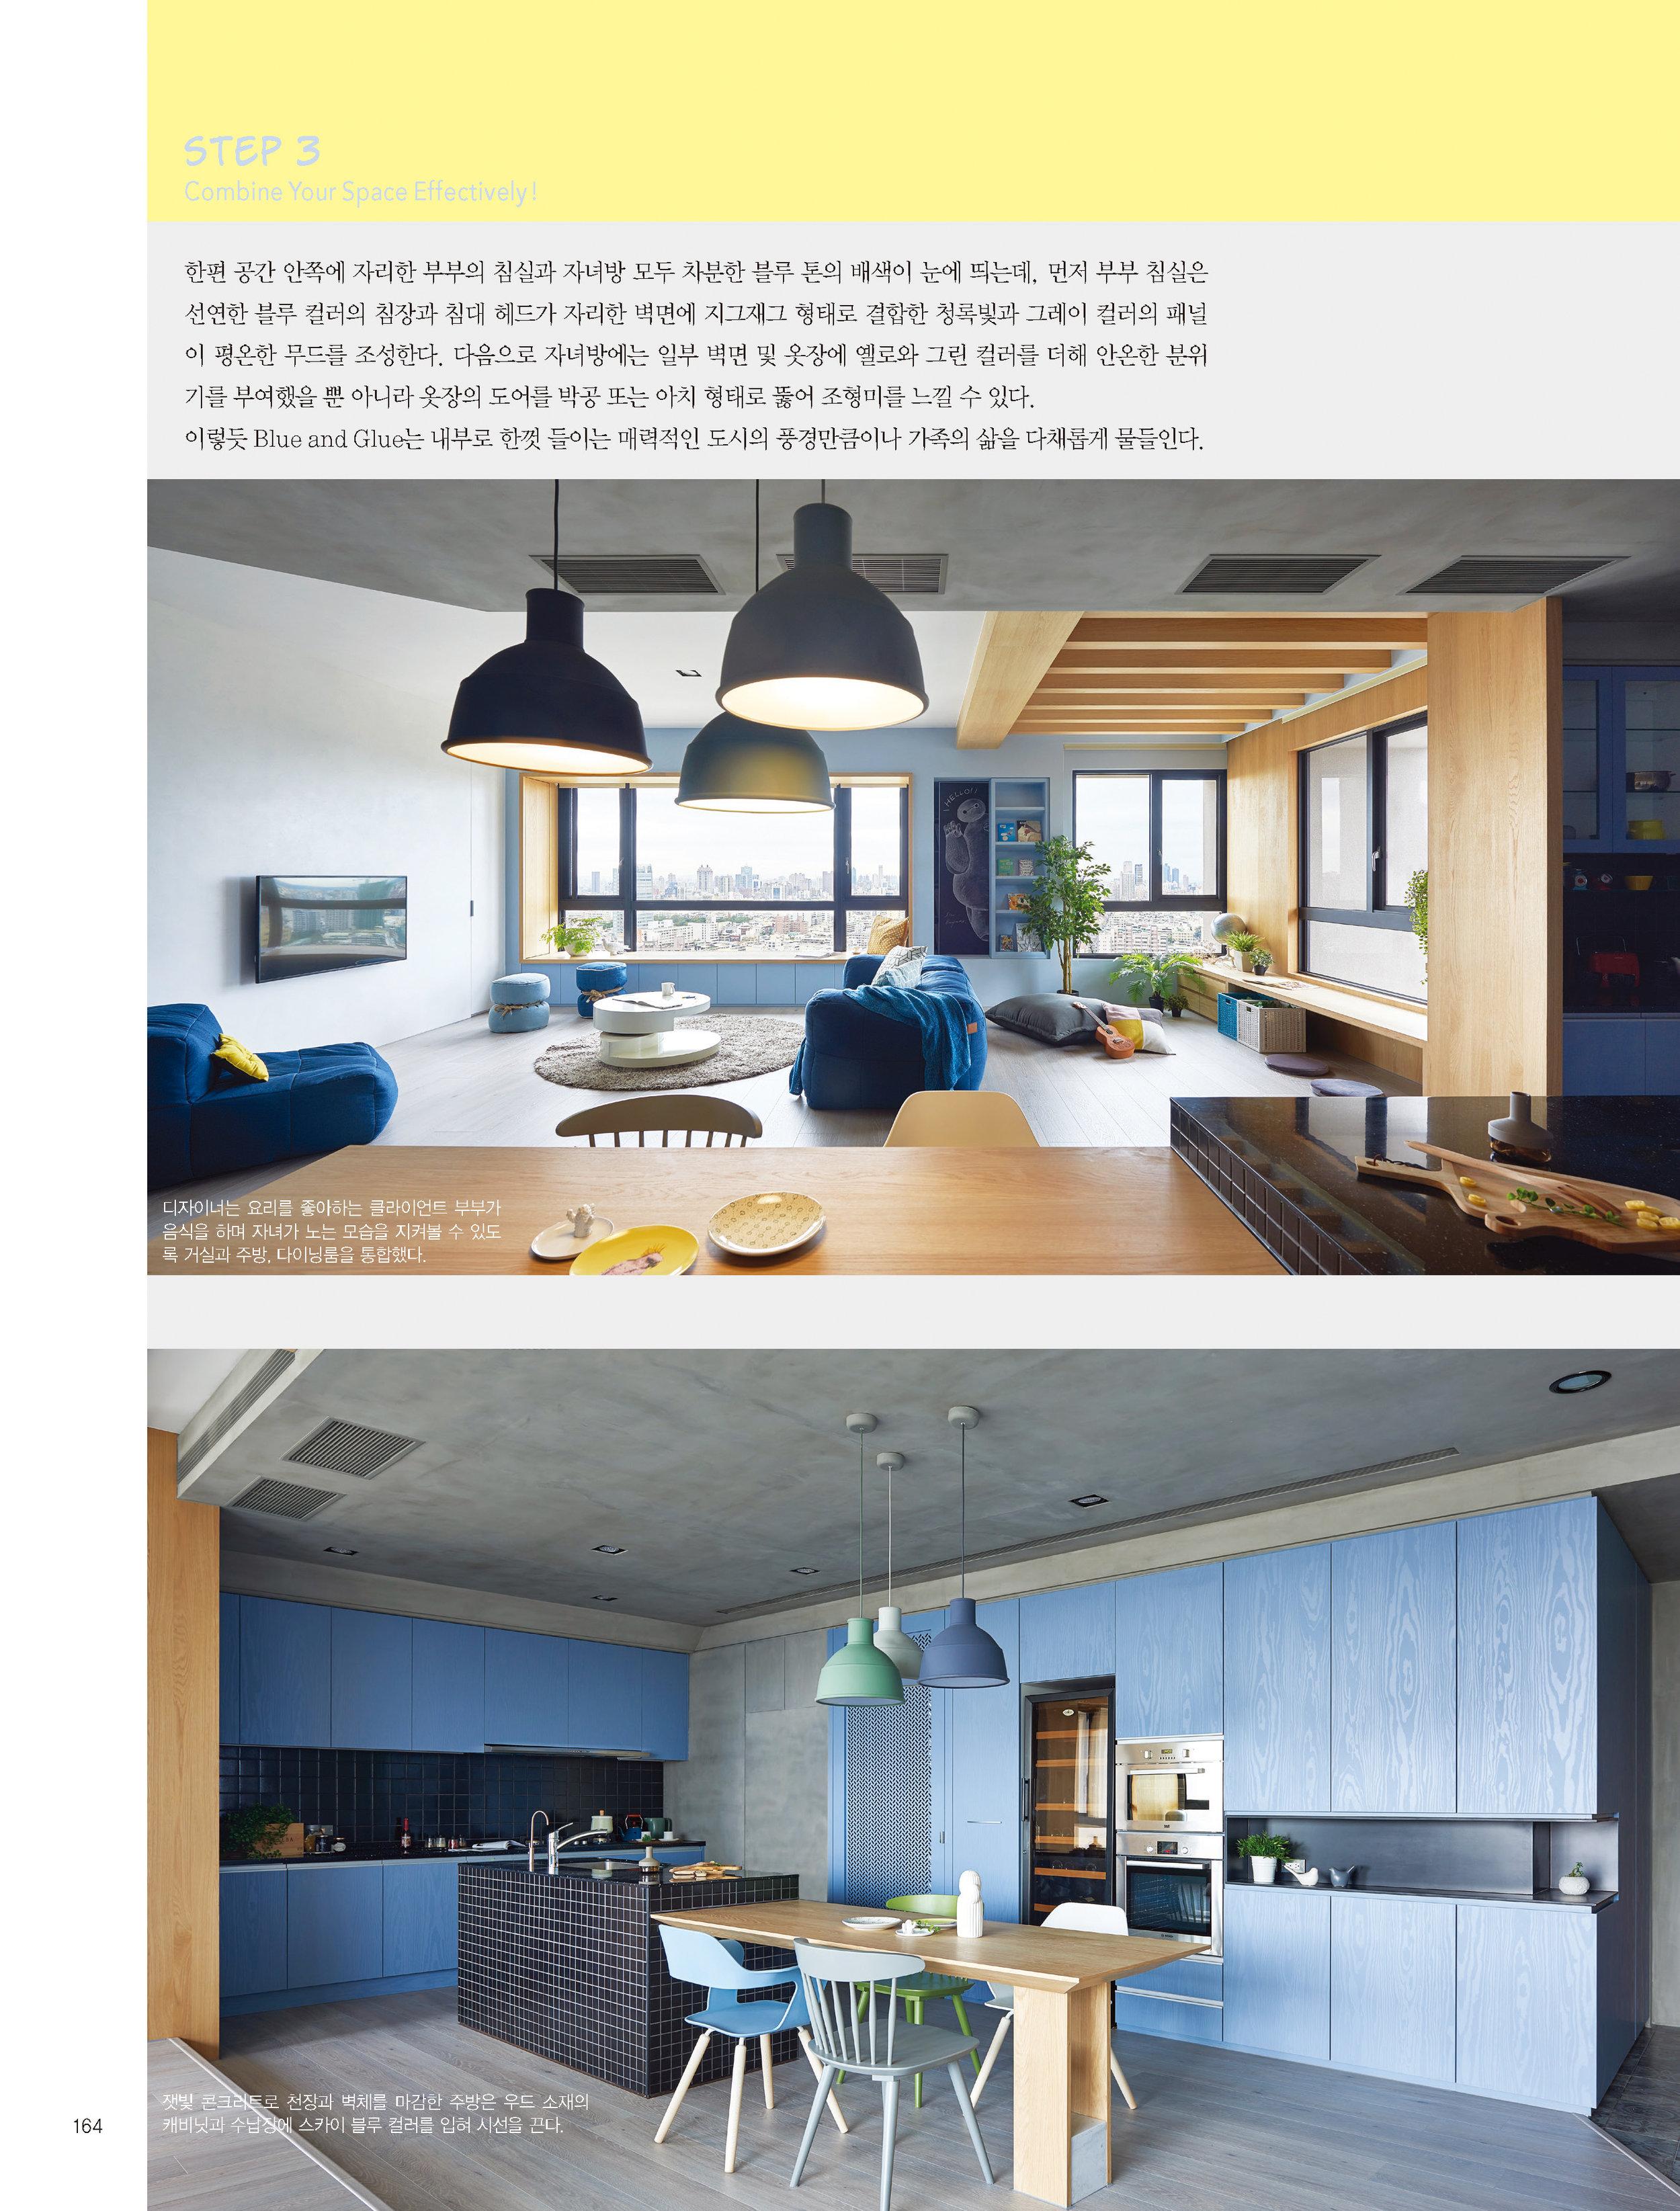 INTERNI & Decor_Zoom in_頁面_09.jpg